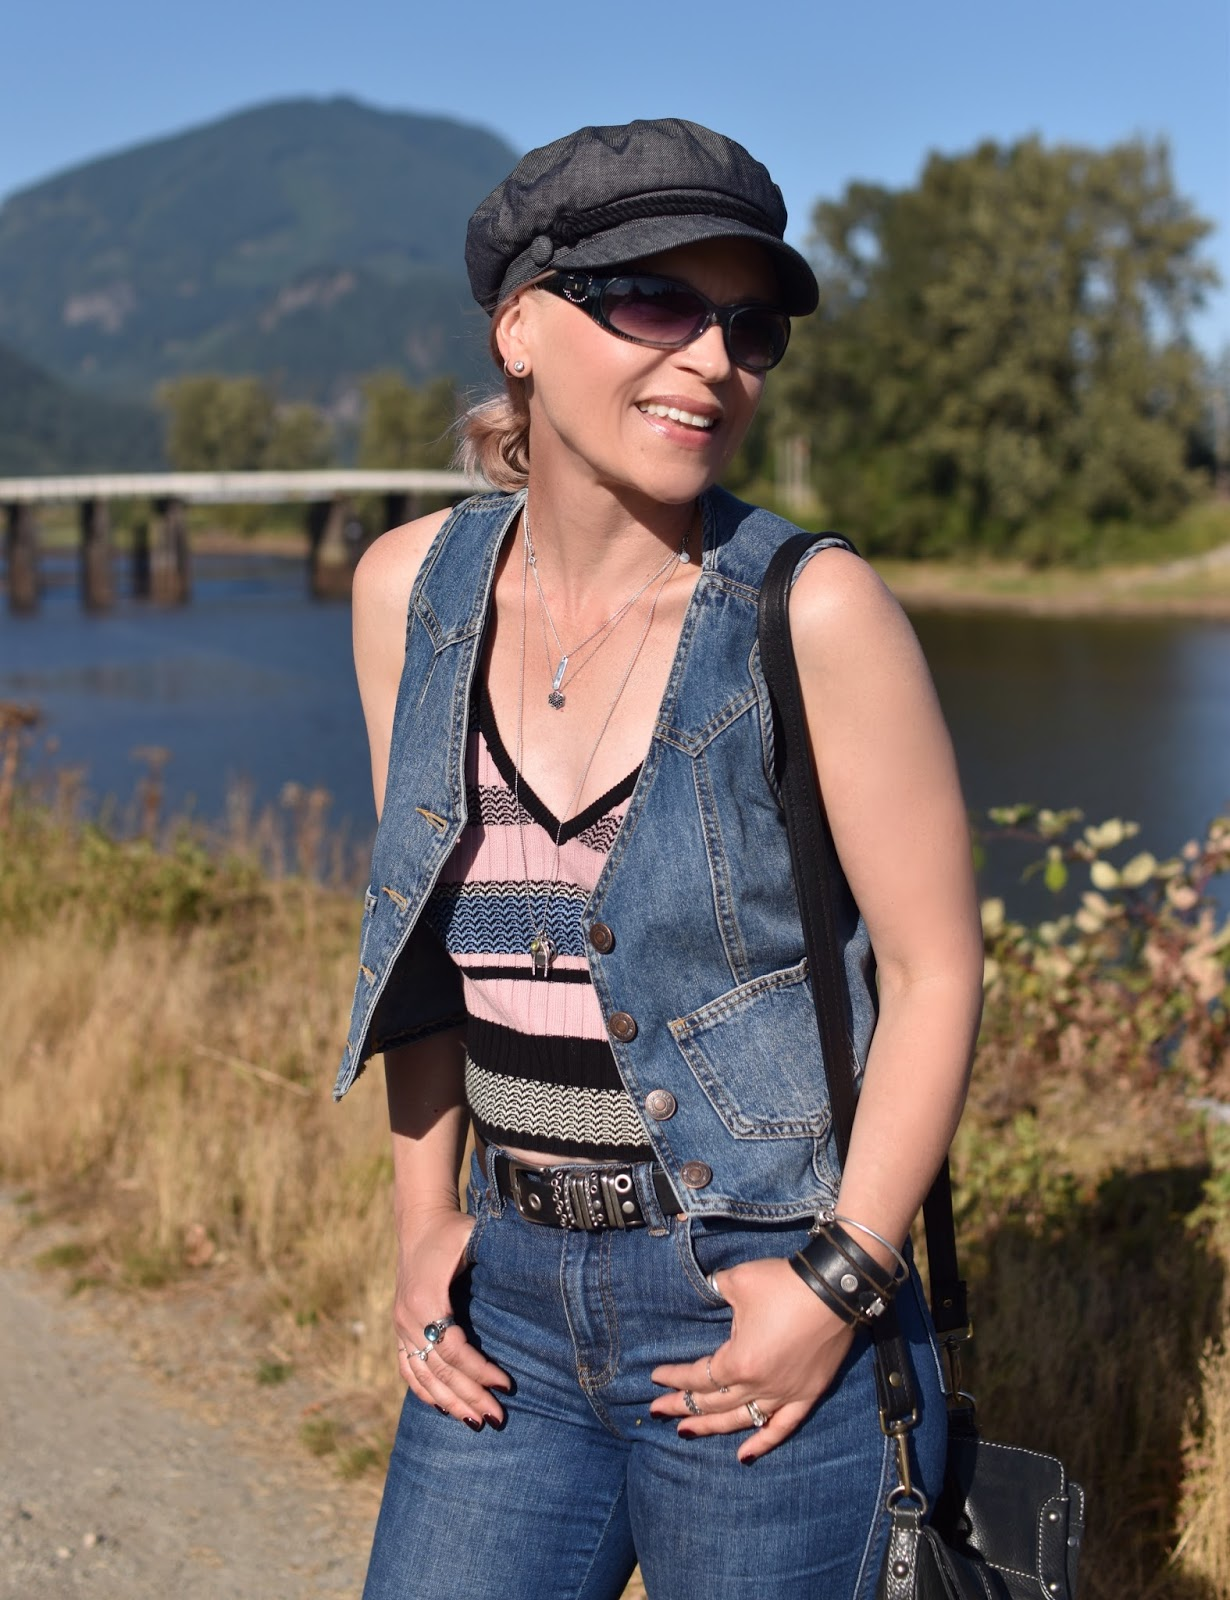 Monika Faulkner outfit inspiration - jeans, striped tank top, denim vest, baker boy cap